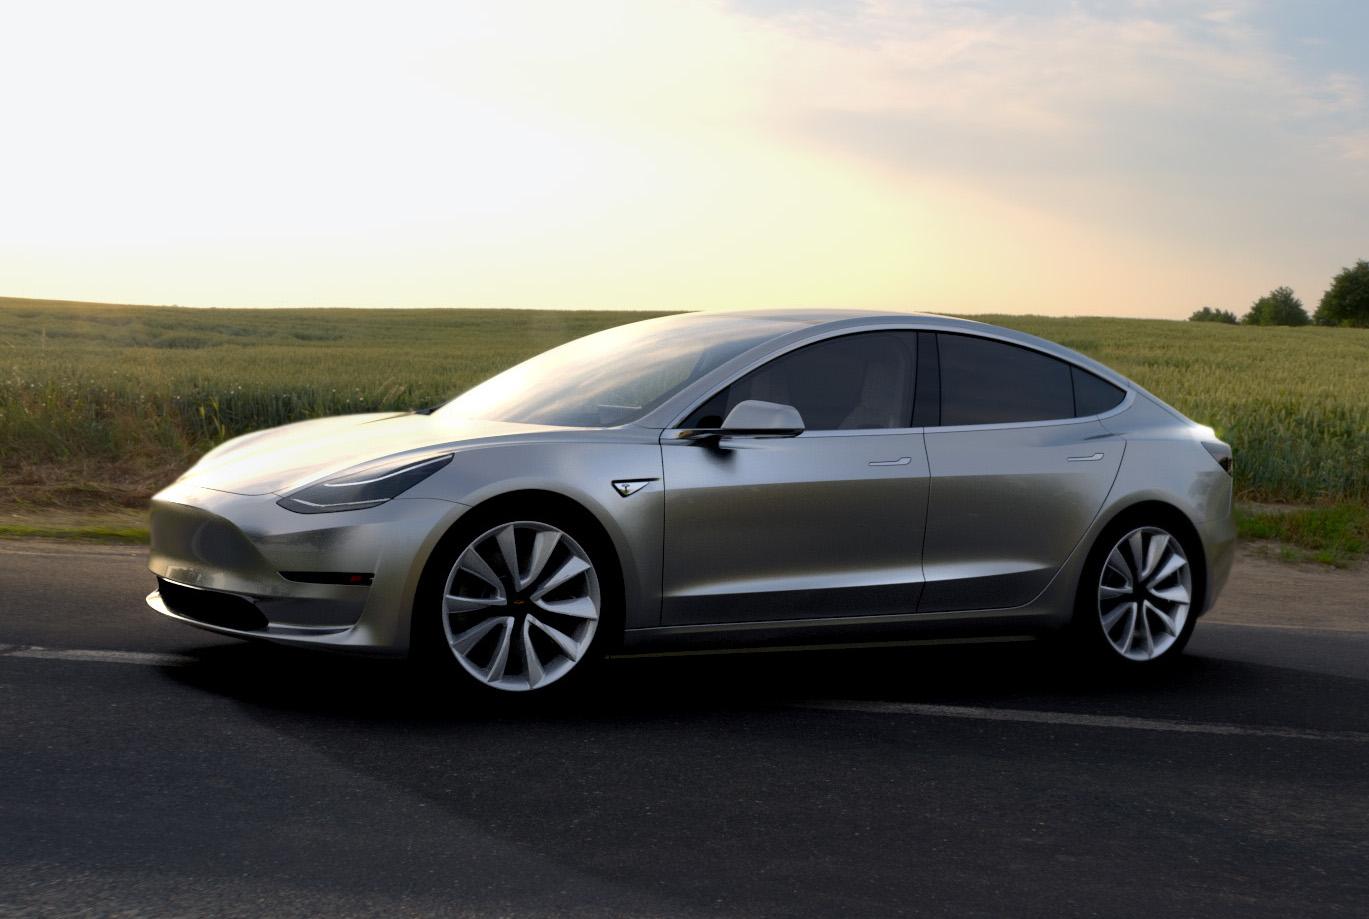 A silver pre-production Tesla Model 3 sedan.